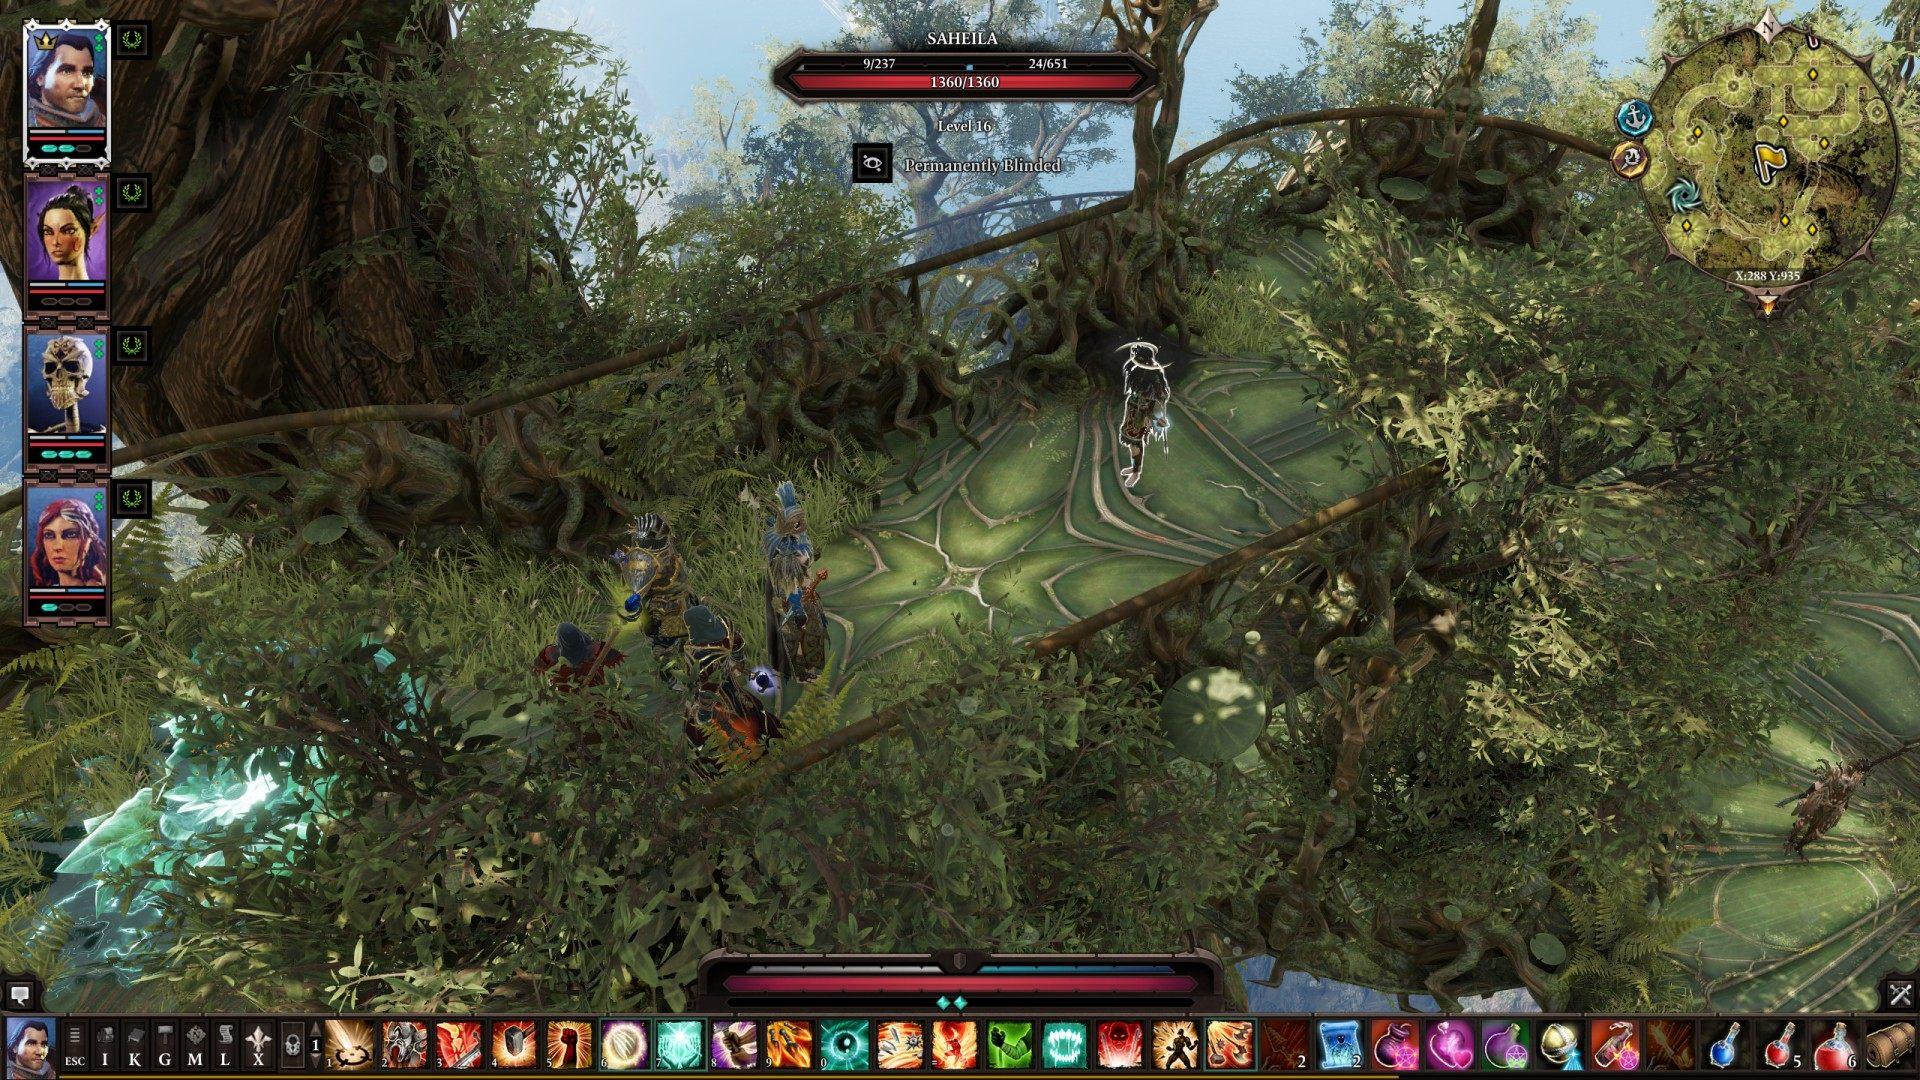 Sebille, Divinity: Original Sin 2 Quest